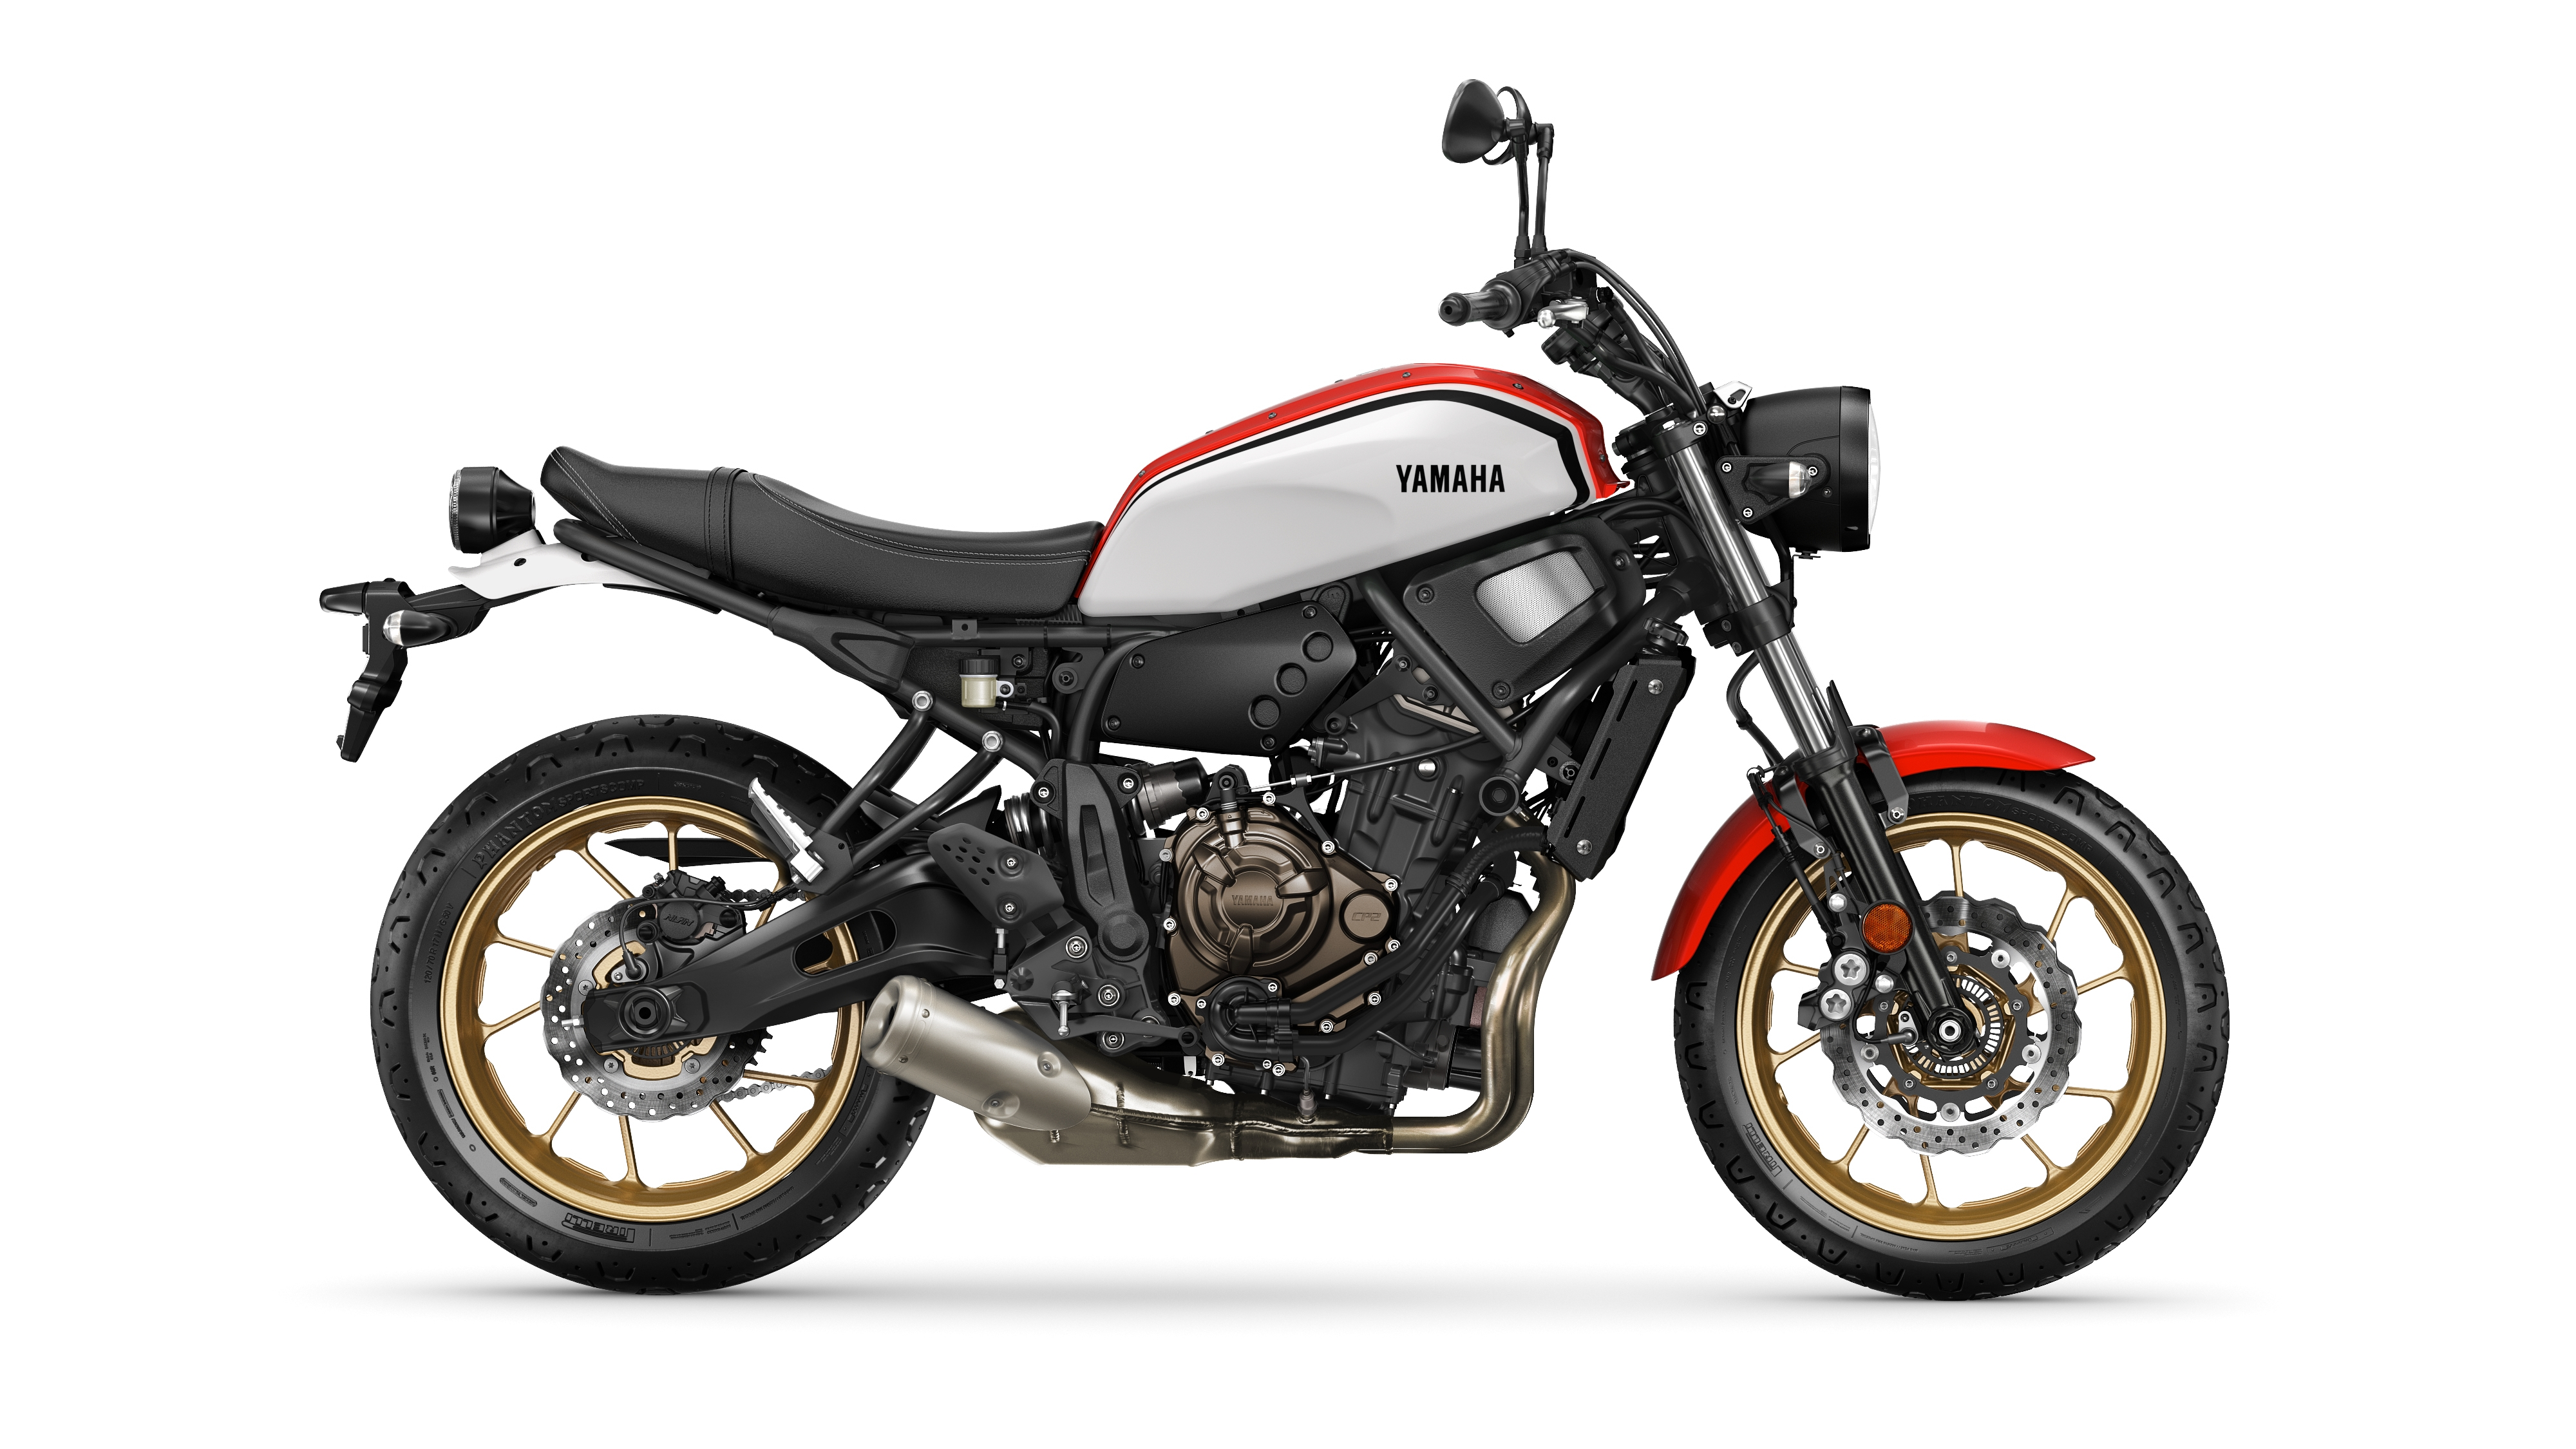 Yamaha XSR700 | MotorCentrumWest